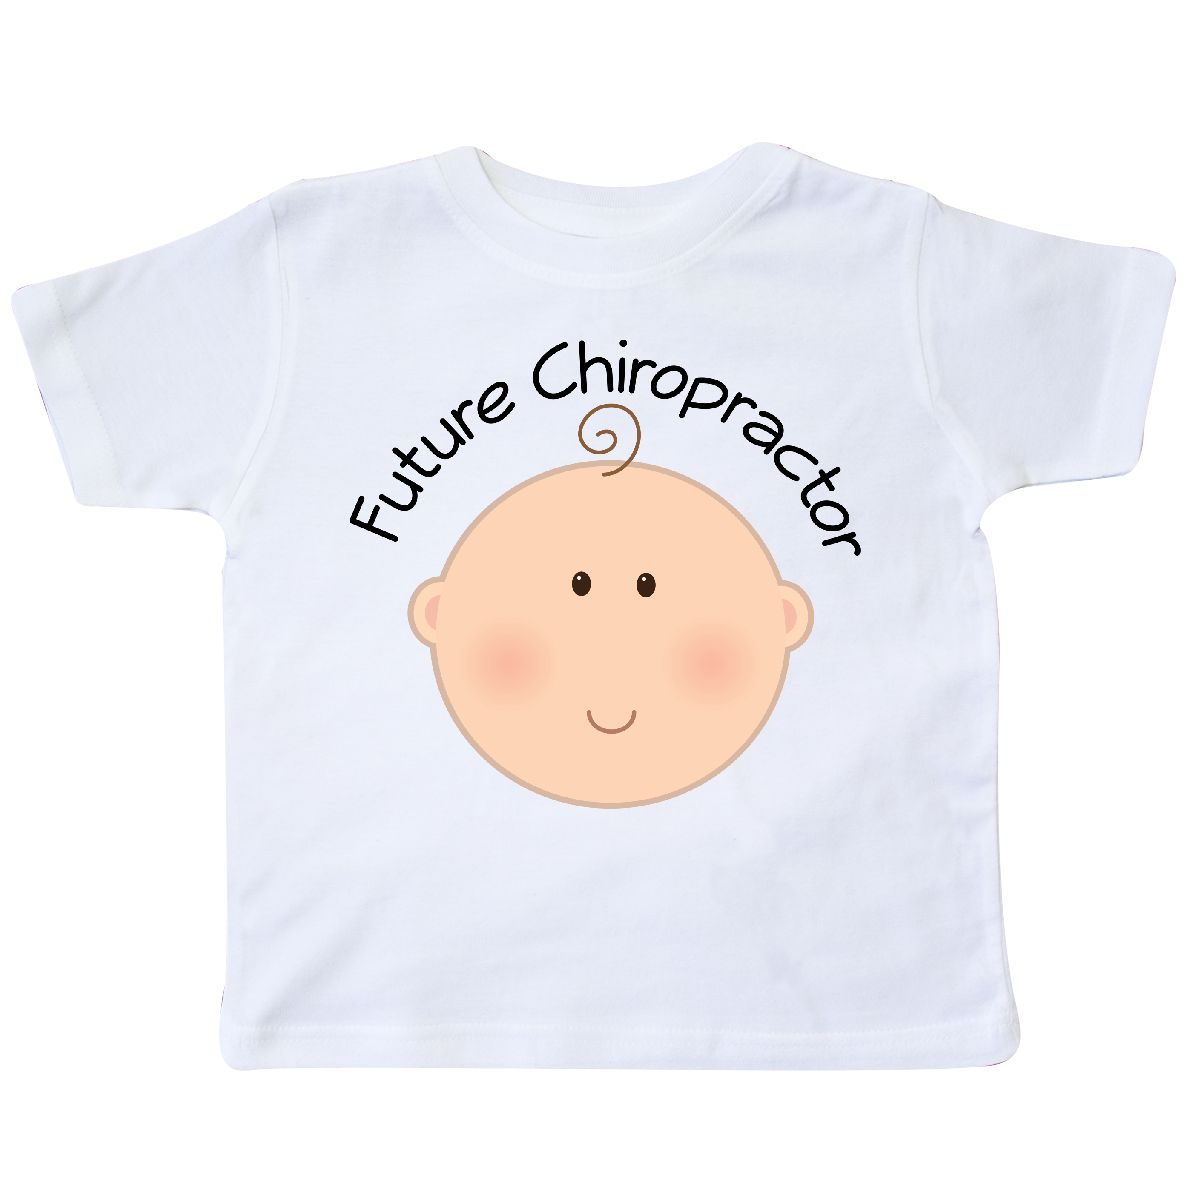 Inktastic Future Chiropractor Baby Toddler T-Shirt Chiropractic Occupation Job